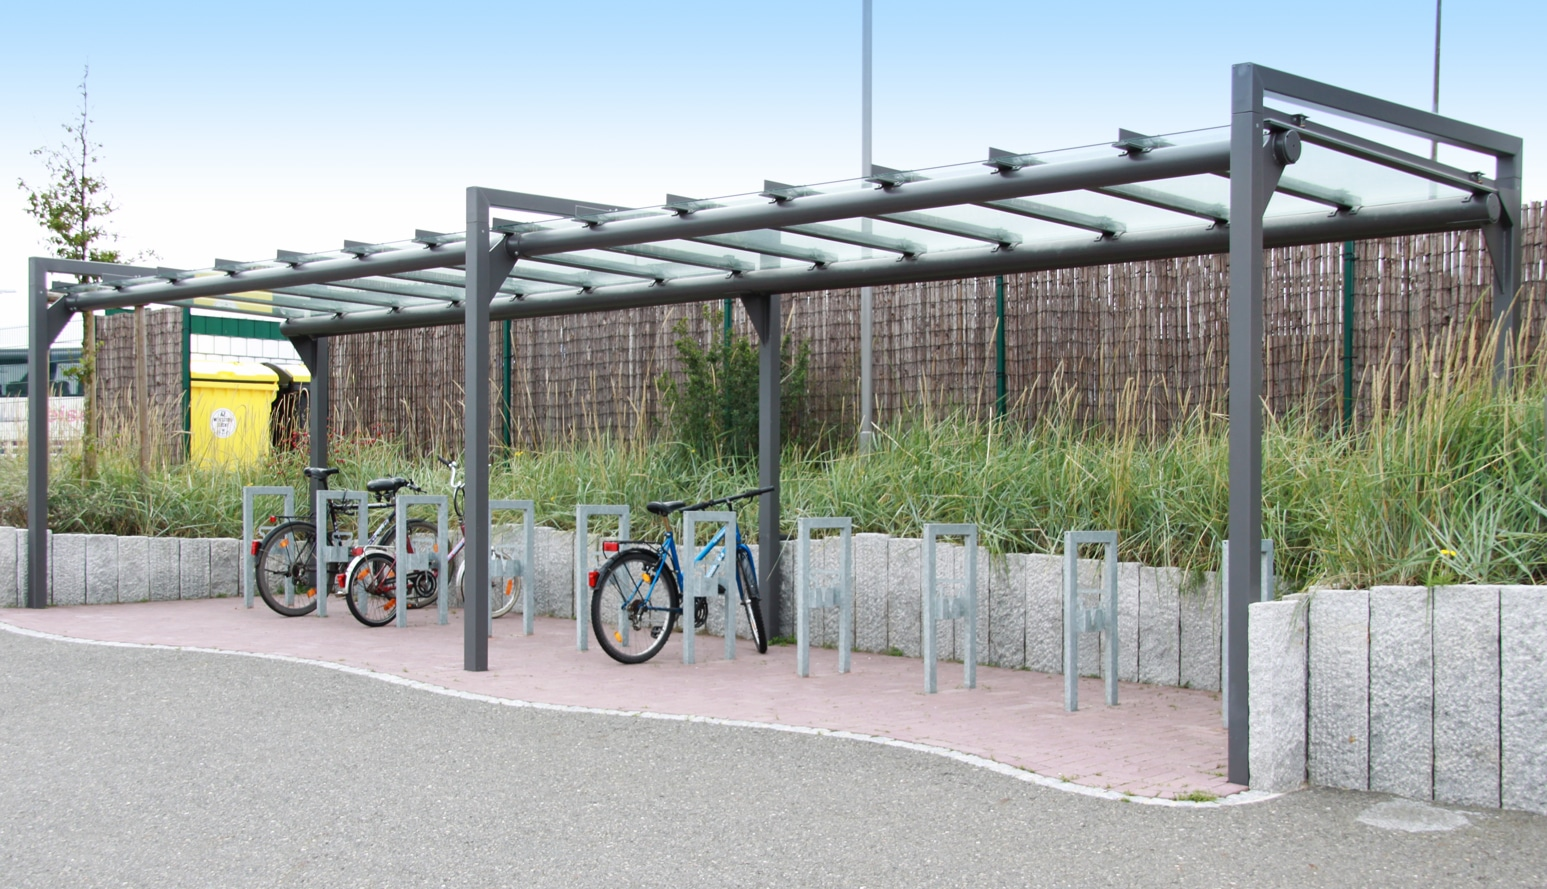 Überdachung frame | bike and ride gmbh